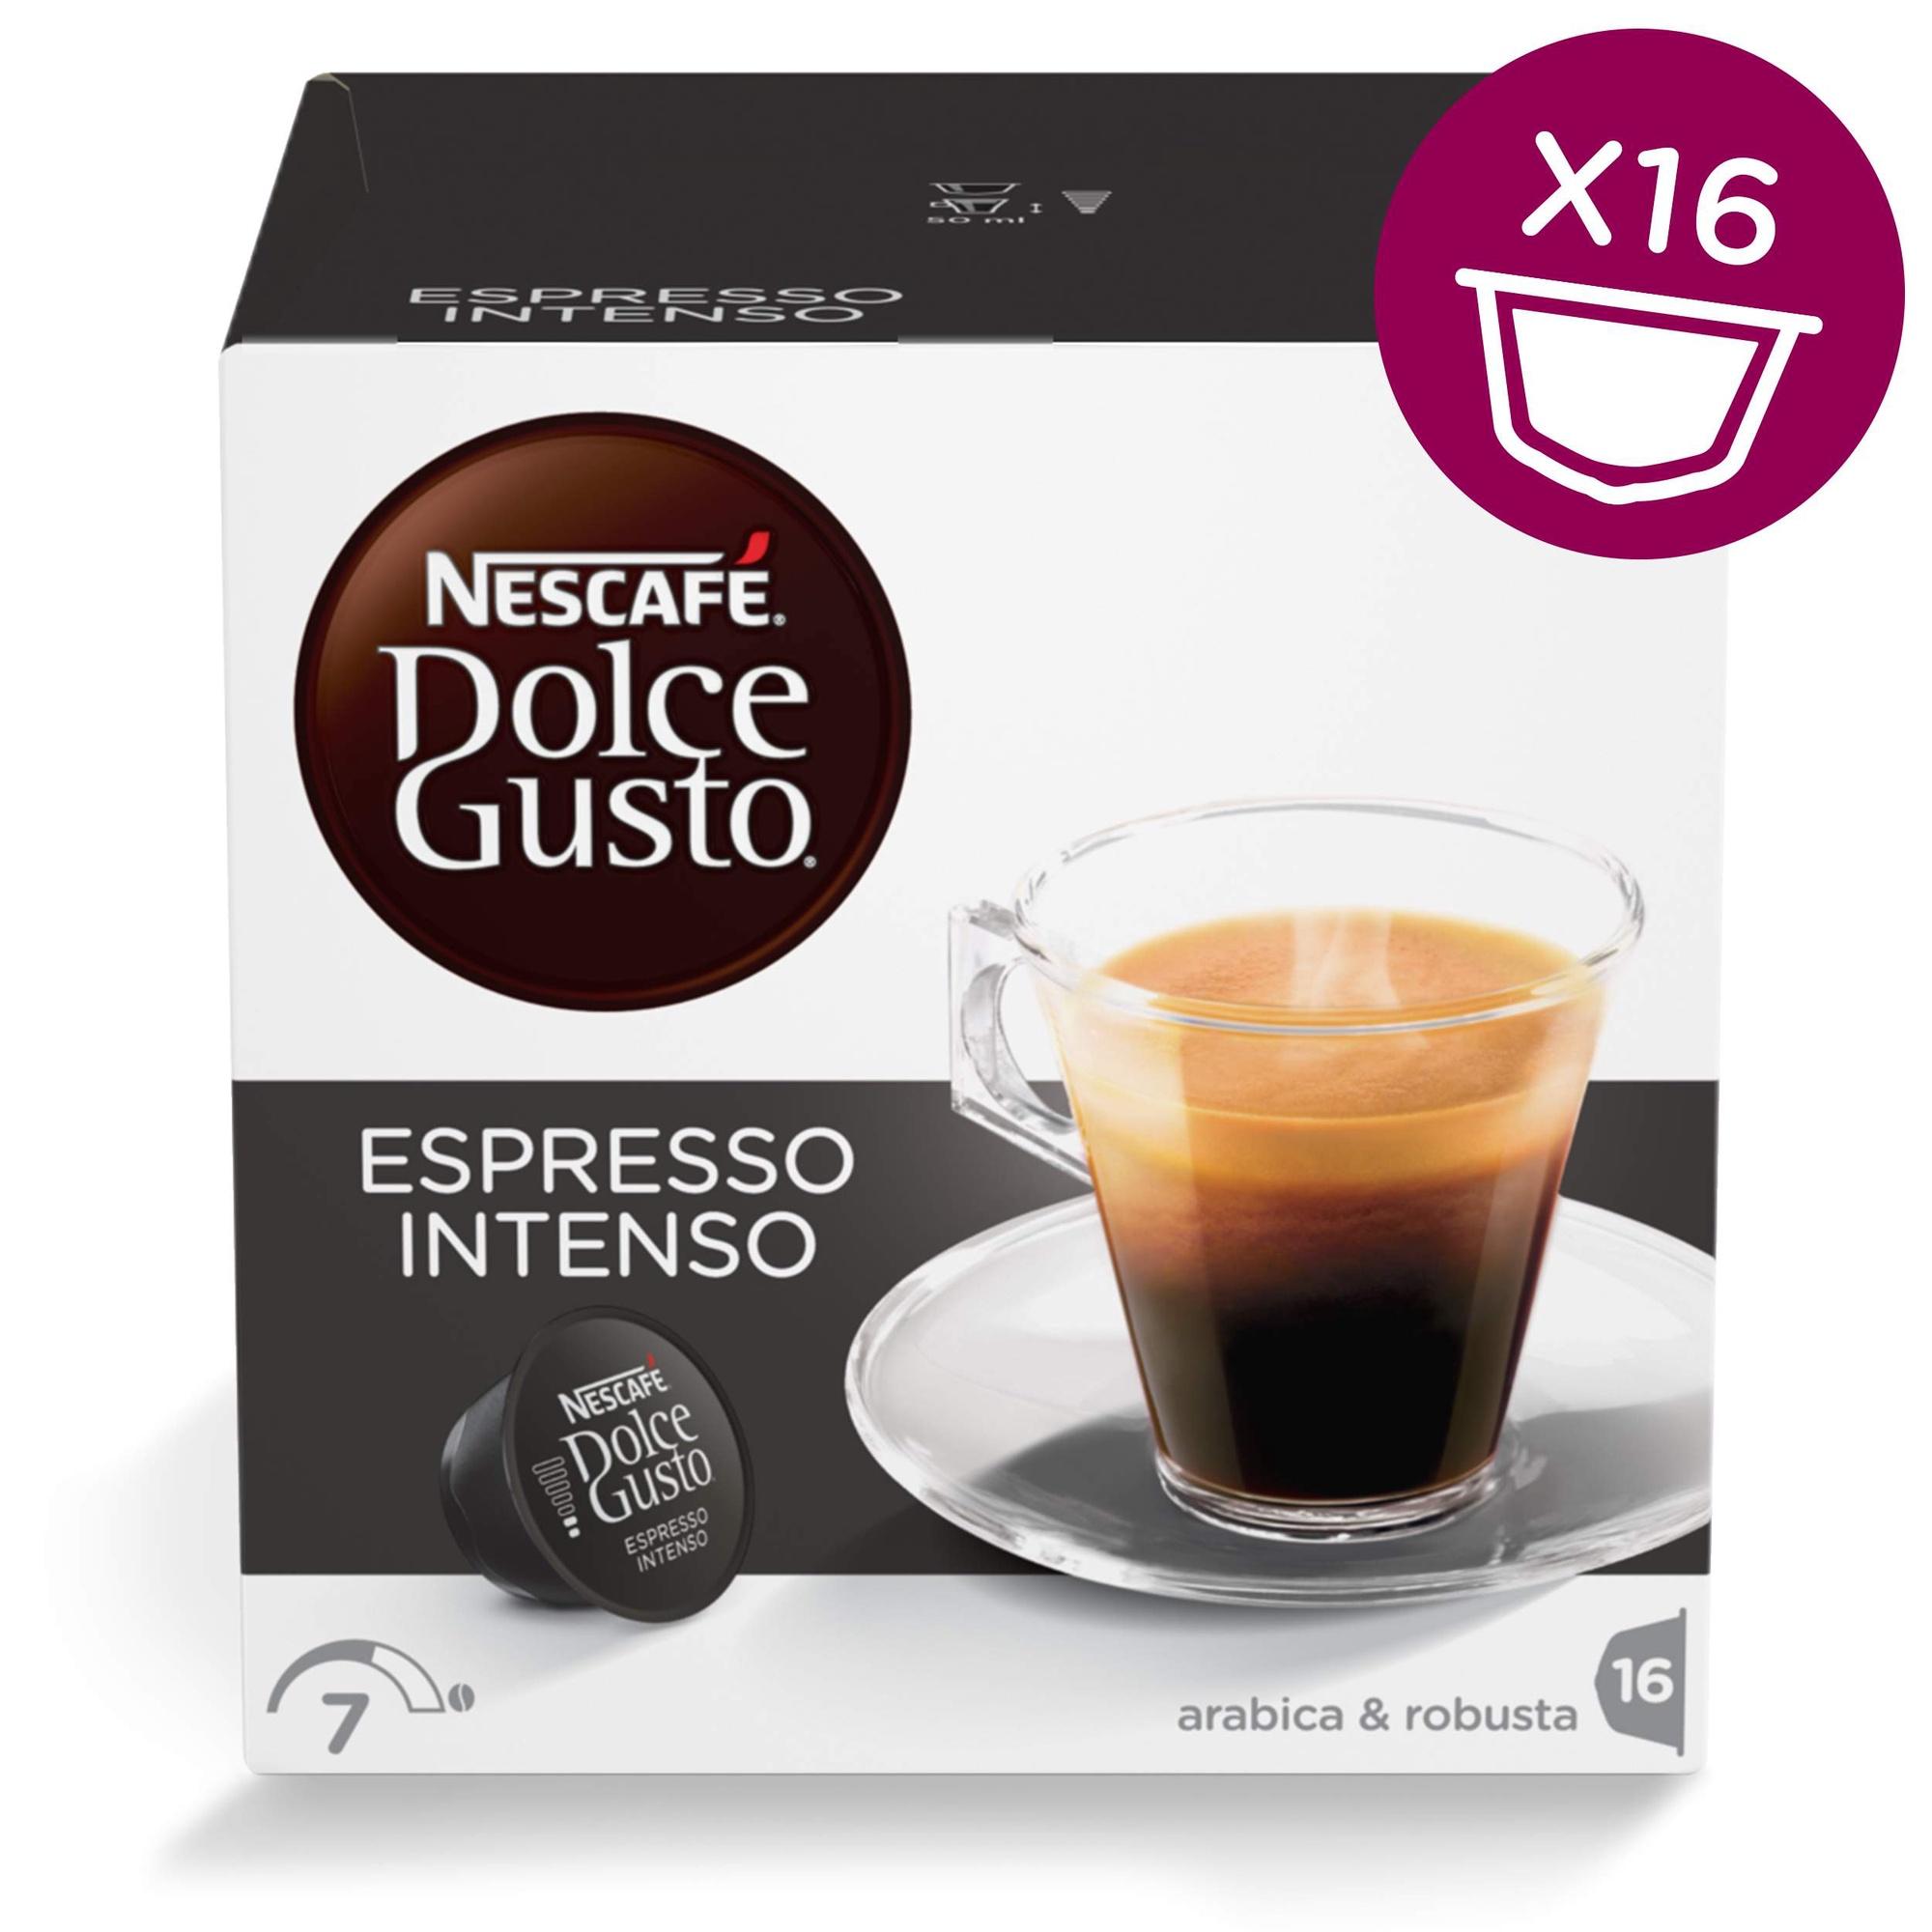 8f3d8ee43bc Nescafe Dolce Gusto Espresso Intenso 16 Capsules - Krauta.ee